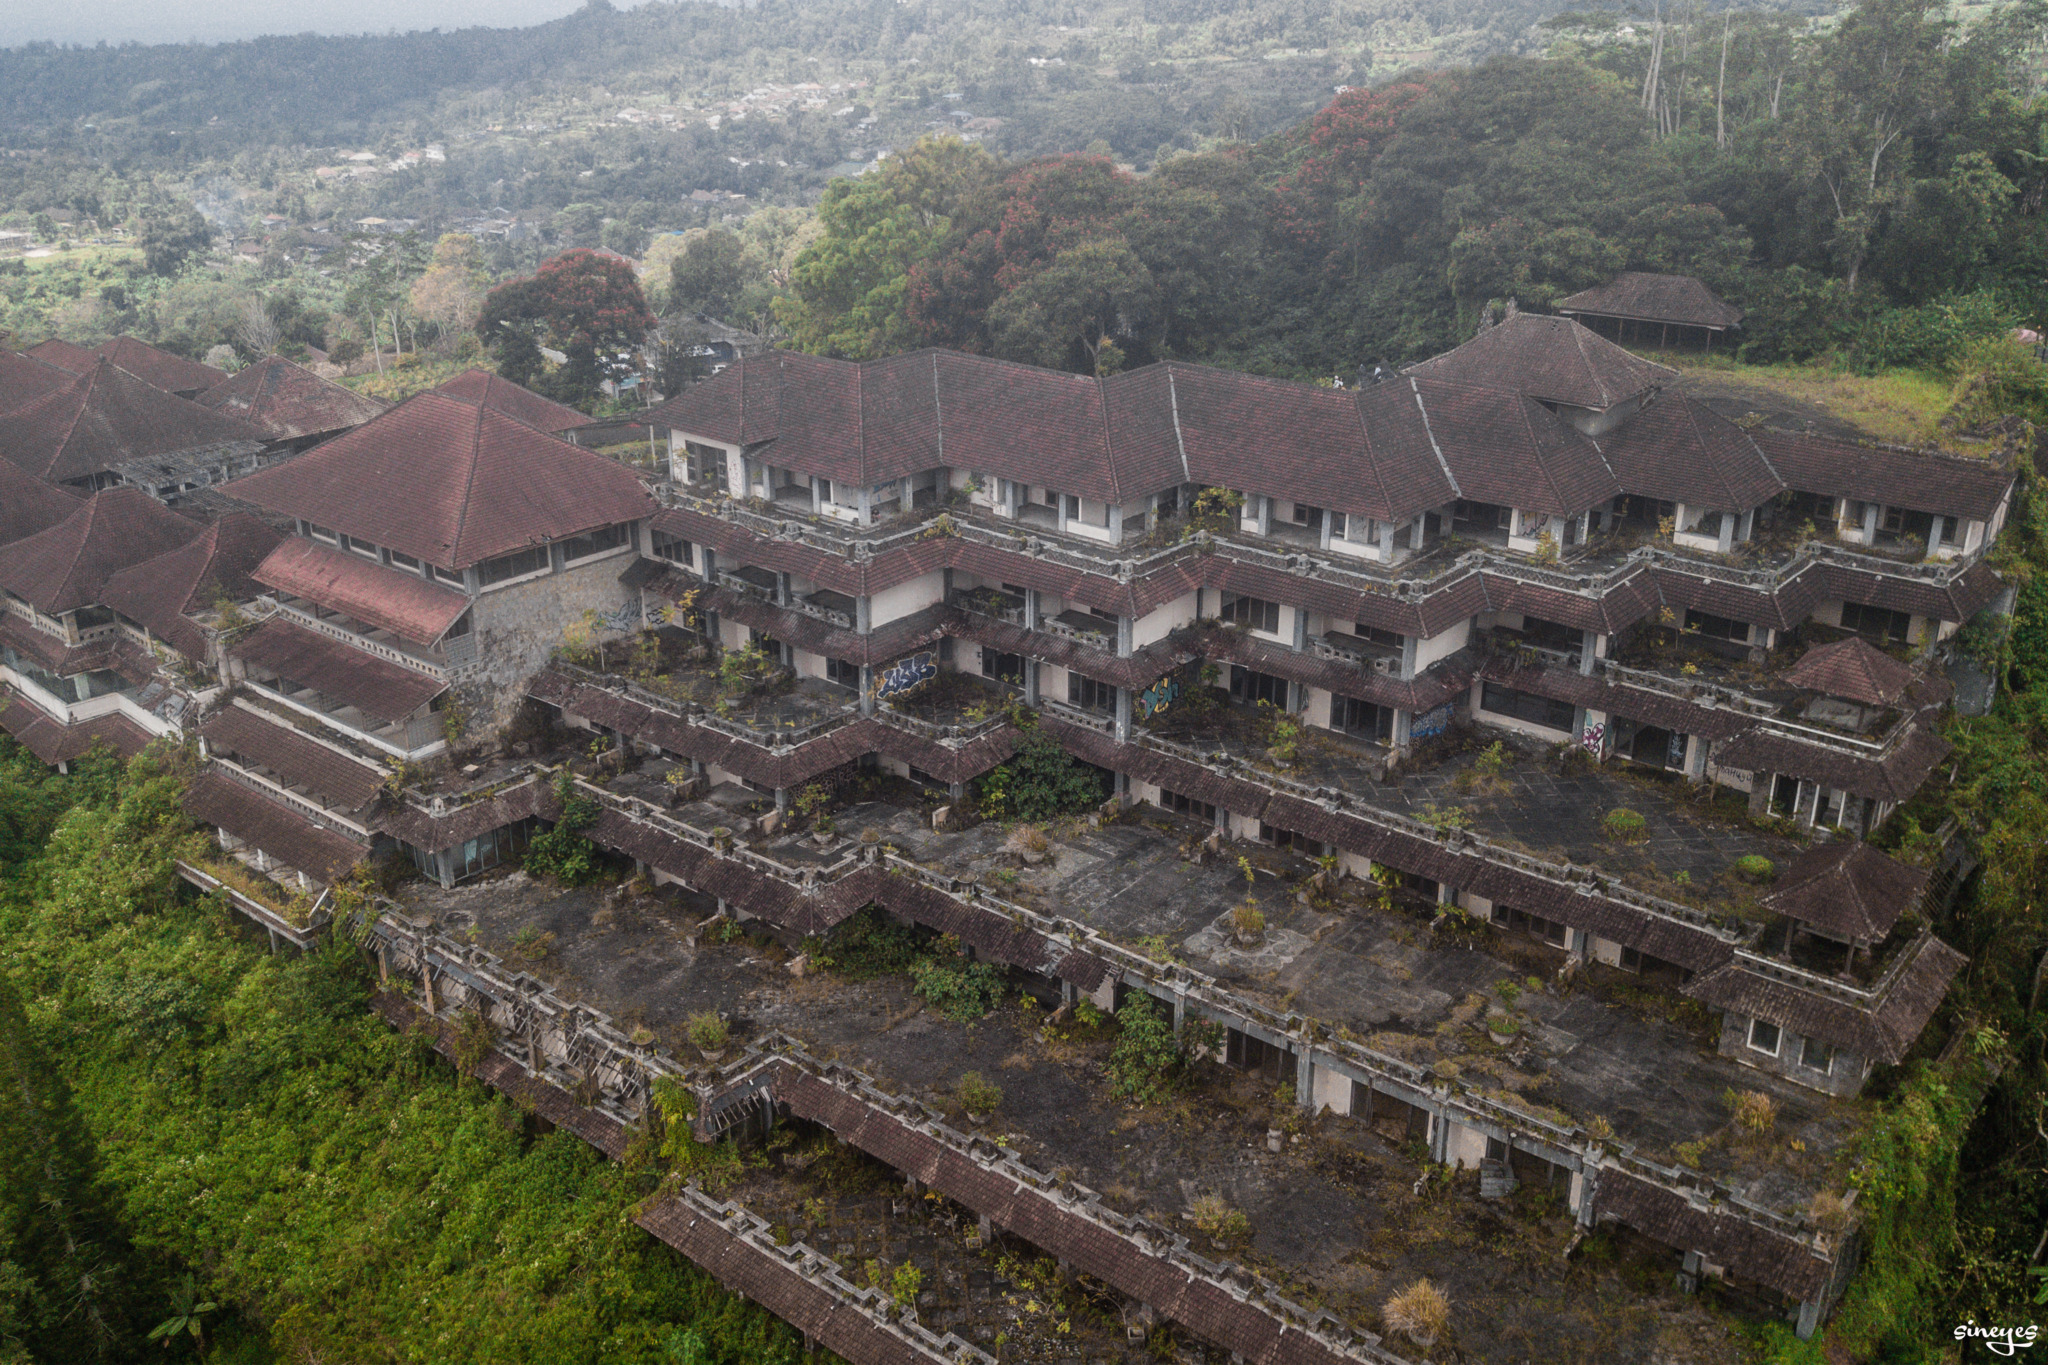 Haunted hostel by sineyes